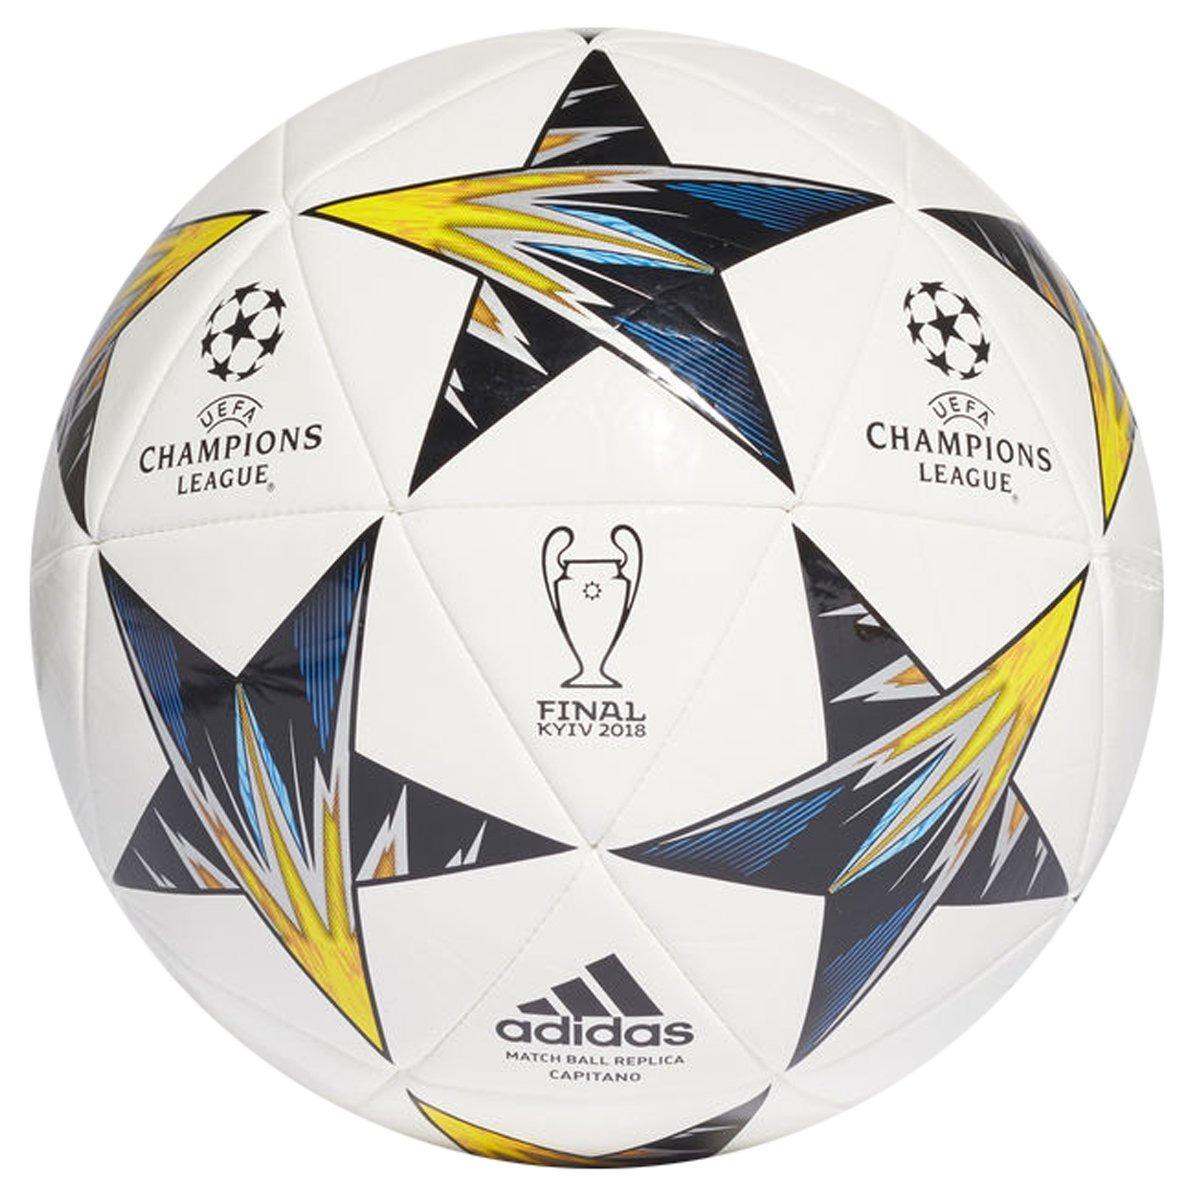 aded4aff6a49d bola oficial adidas champions league finale kiev 18 campo. Carregando zoom.